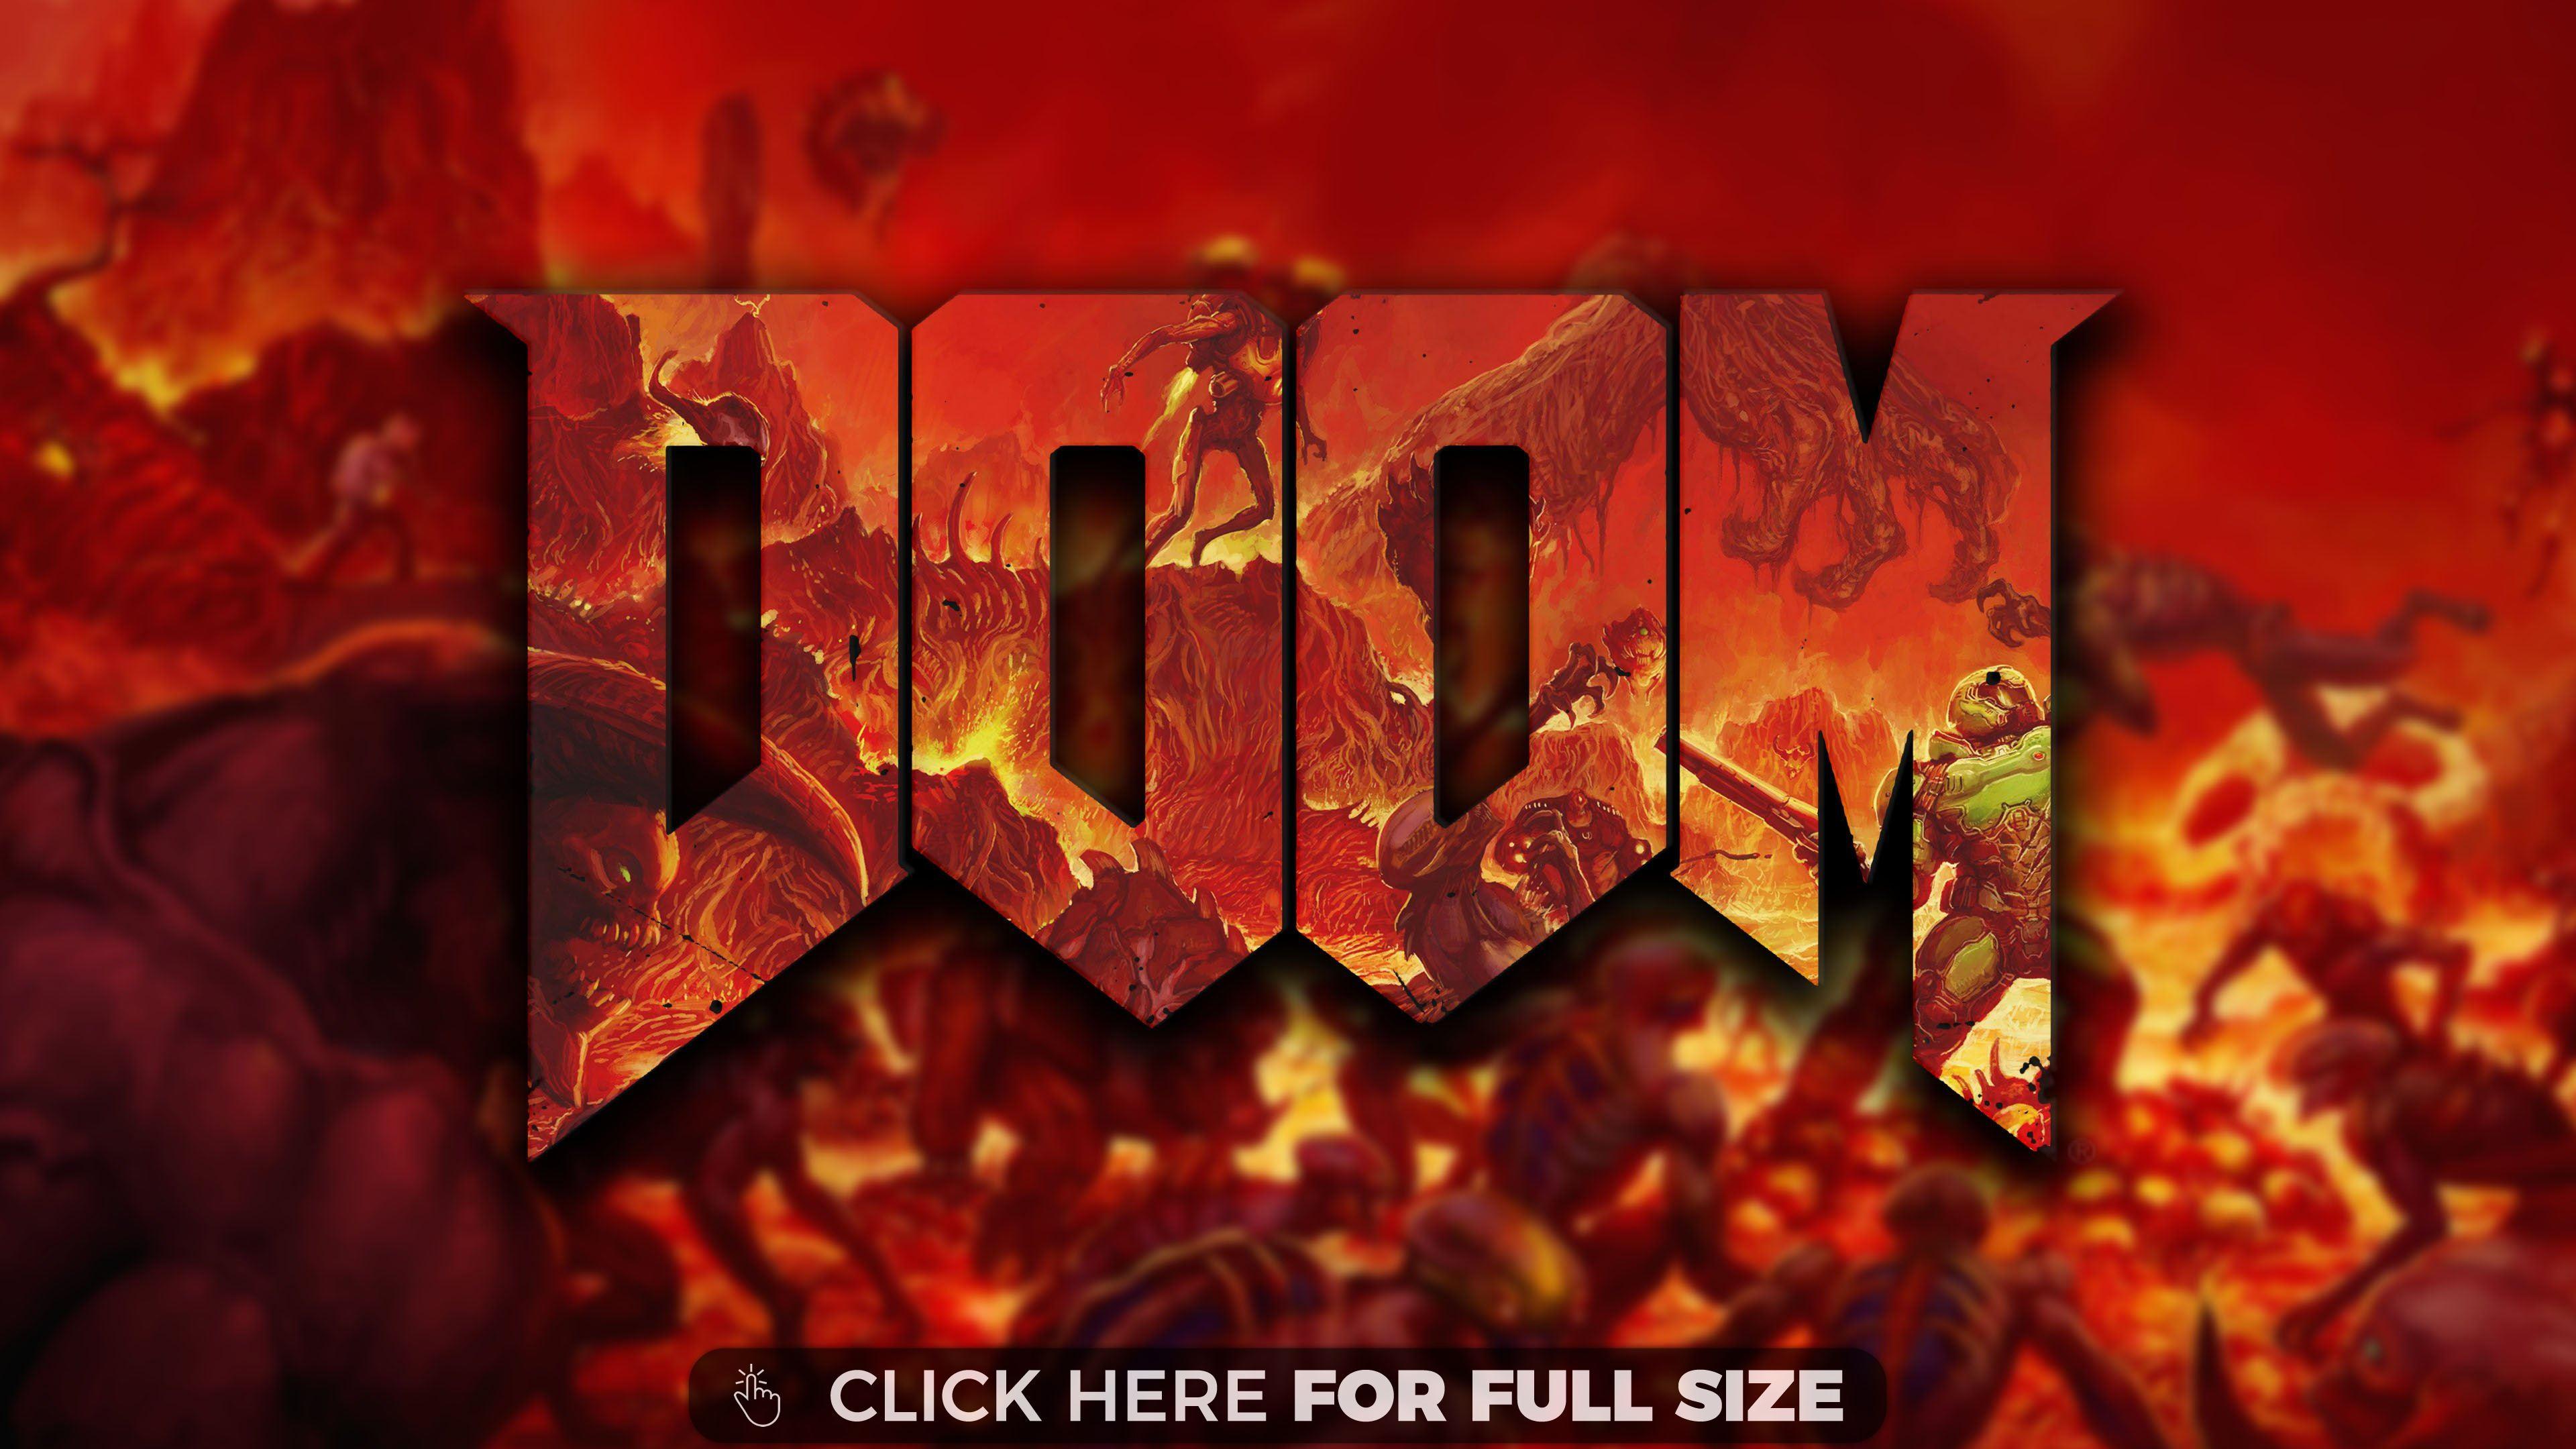 3840x2160px doom wallpaper - wallpapersafari